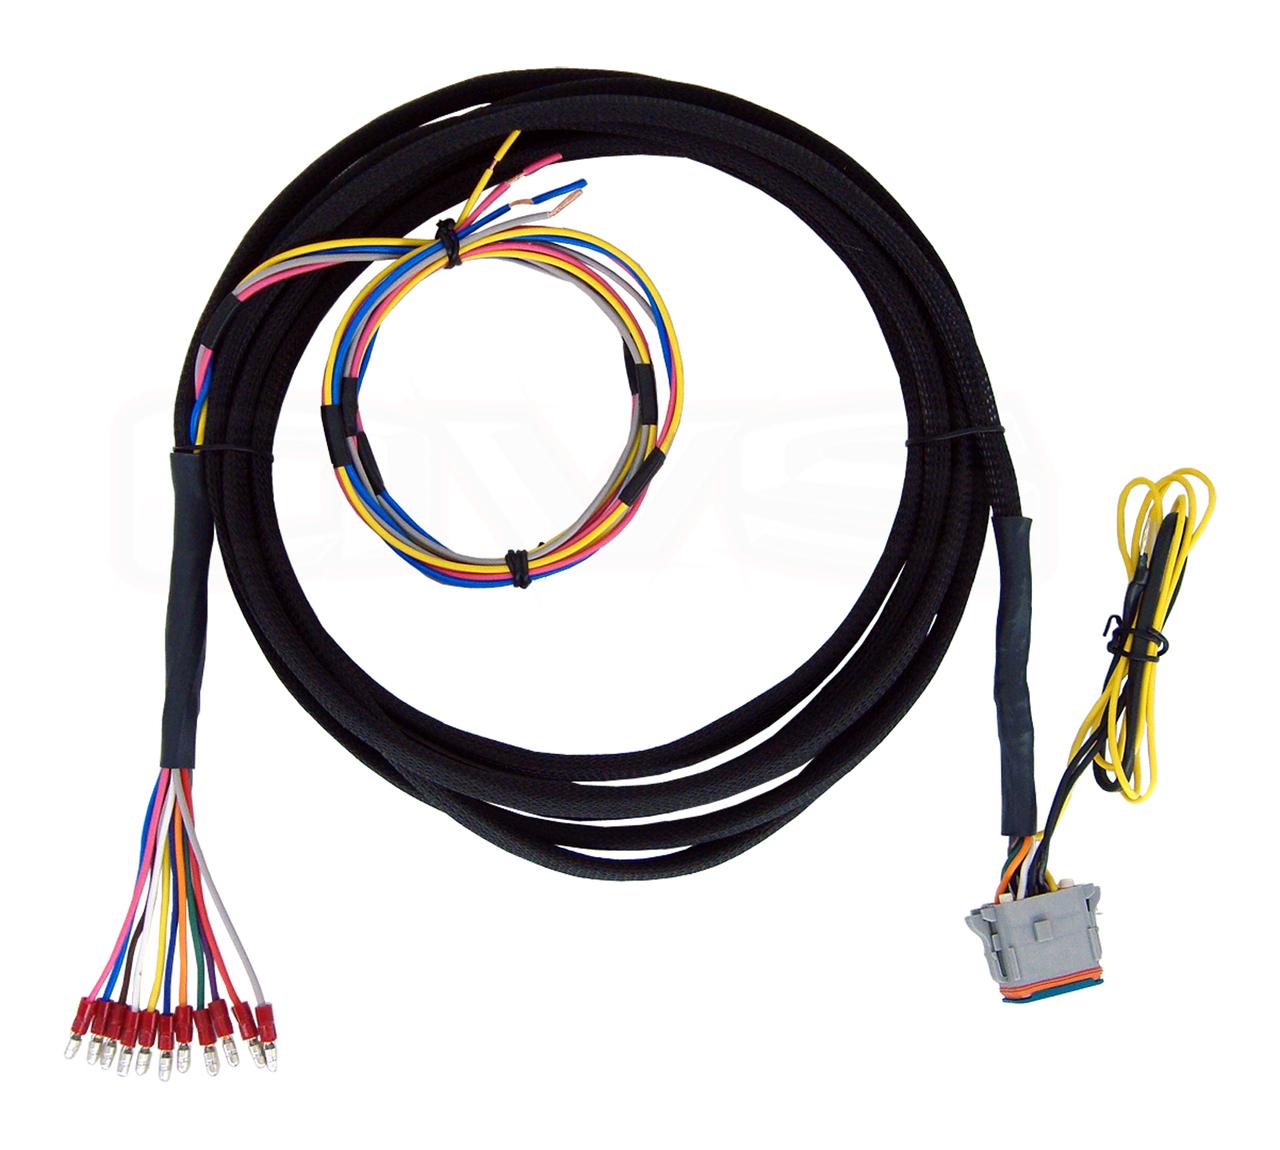 Accuiar Vu4 7 Switch Box Harness Enhanced Customs Wiring Accuair Avsswitchbox Wireharness